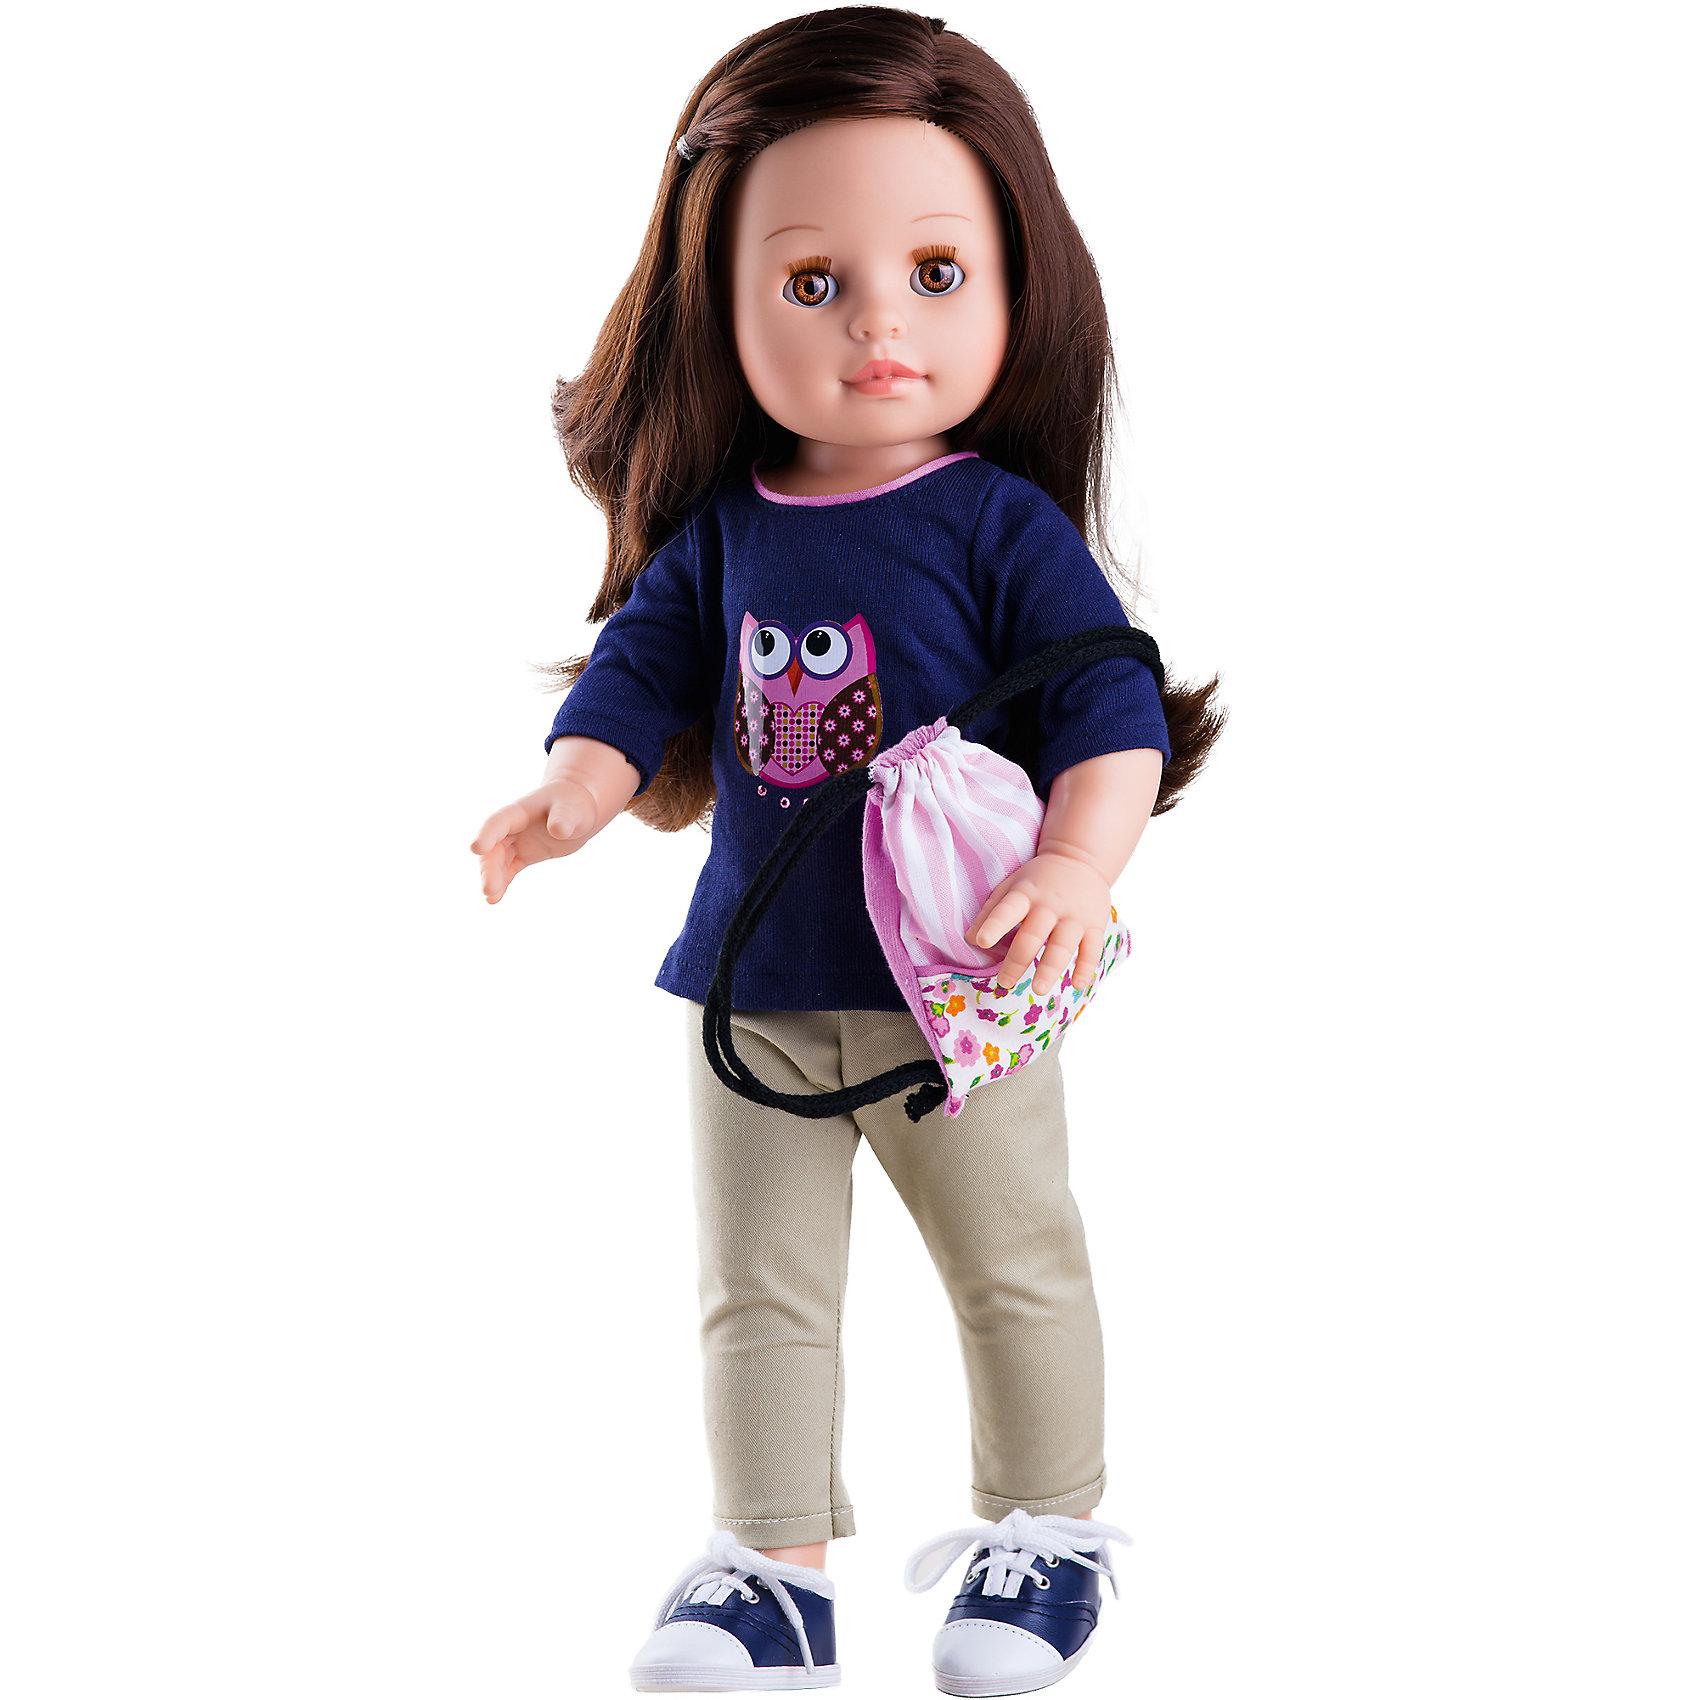 Кукла Эмили, 42 см, Paola ReinaКлассические куклы<br><br><br>Ширина мм: 510<br>Глубина мм: 175<br>Высота мм: 105<br>Вес г: 1225<br>Возраст от месяцев: 36<br>Возраст до месяцев: 144<br>Пол: Женский<br>Возраст: Детский<br>SKU: 6671055